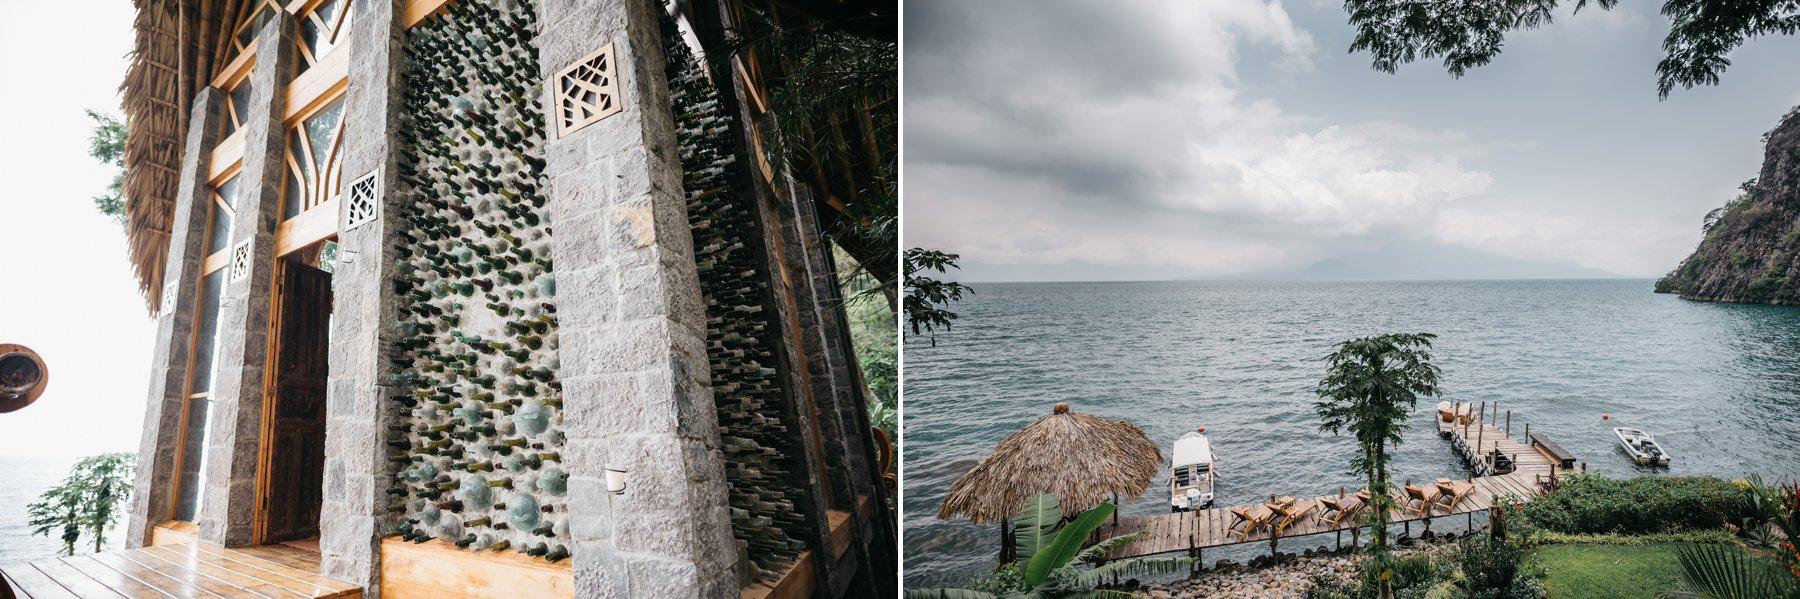 Boda de Destino Lago Atitlan